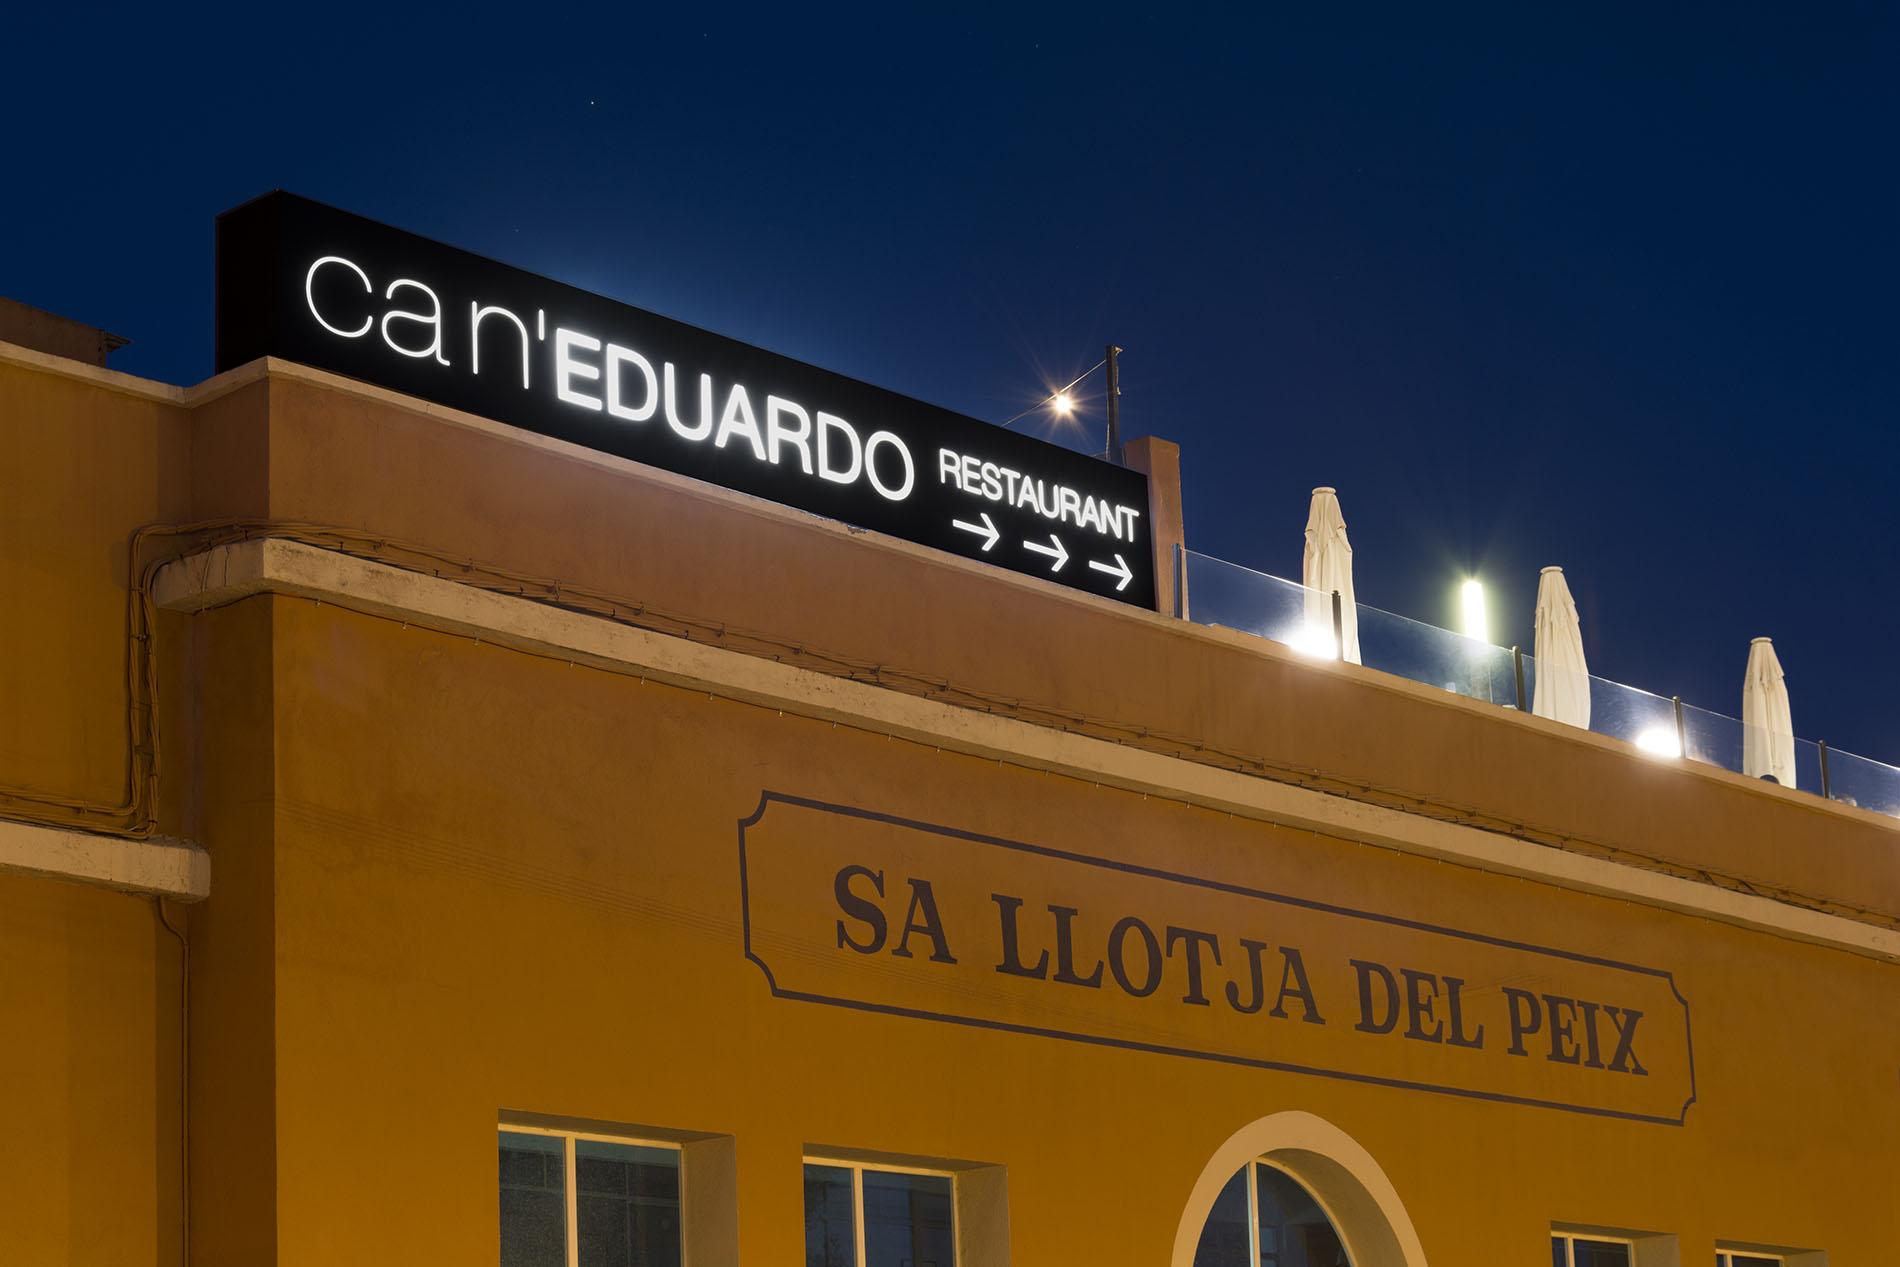 about us, quienes somos, Can Eduardo Restaurant